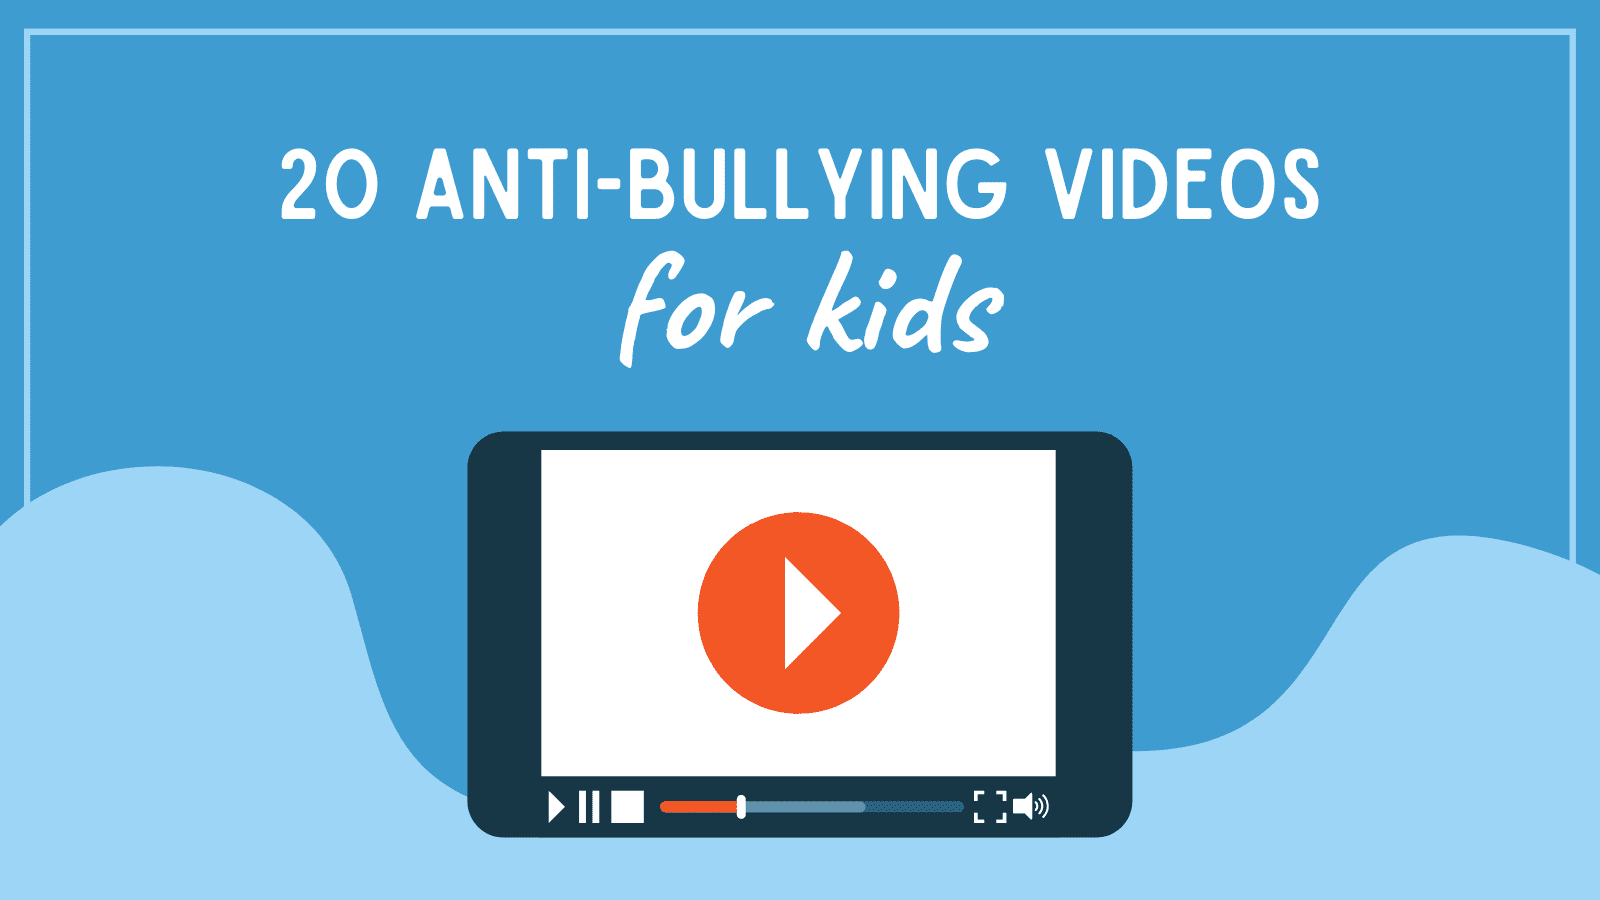 20 anti-bullying videos for kids